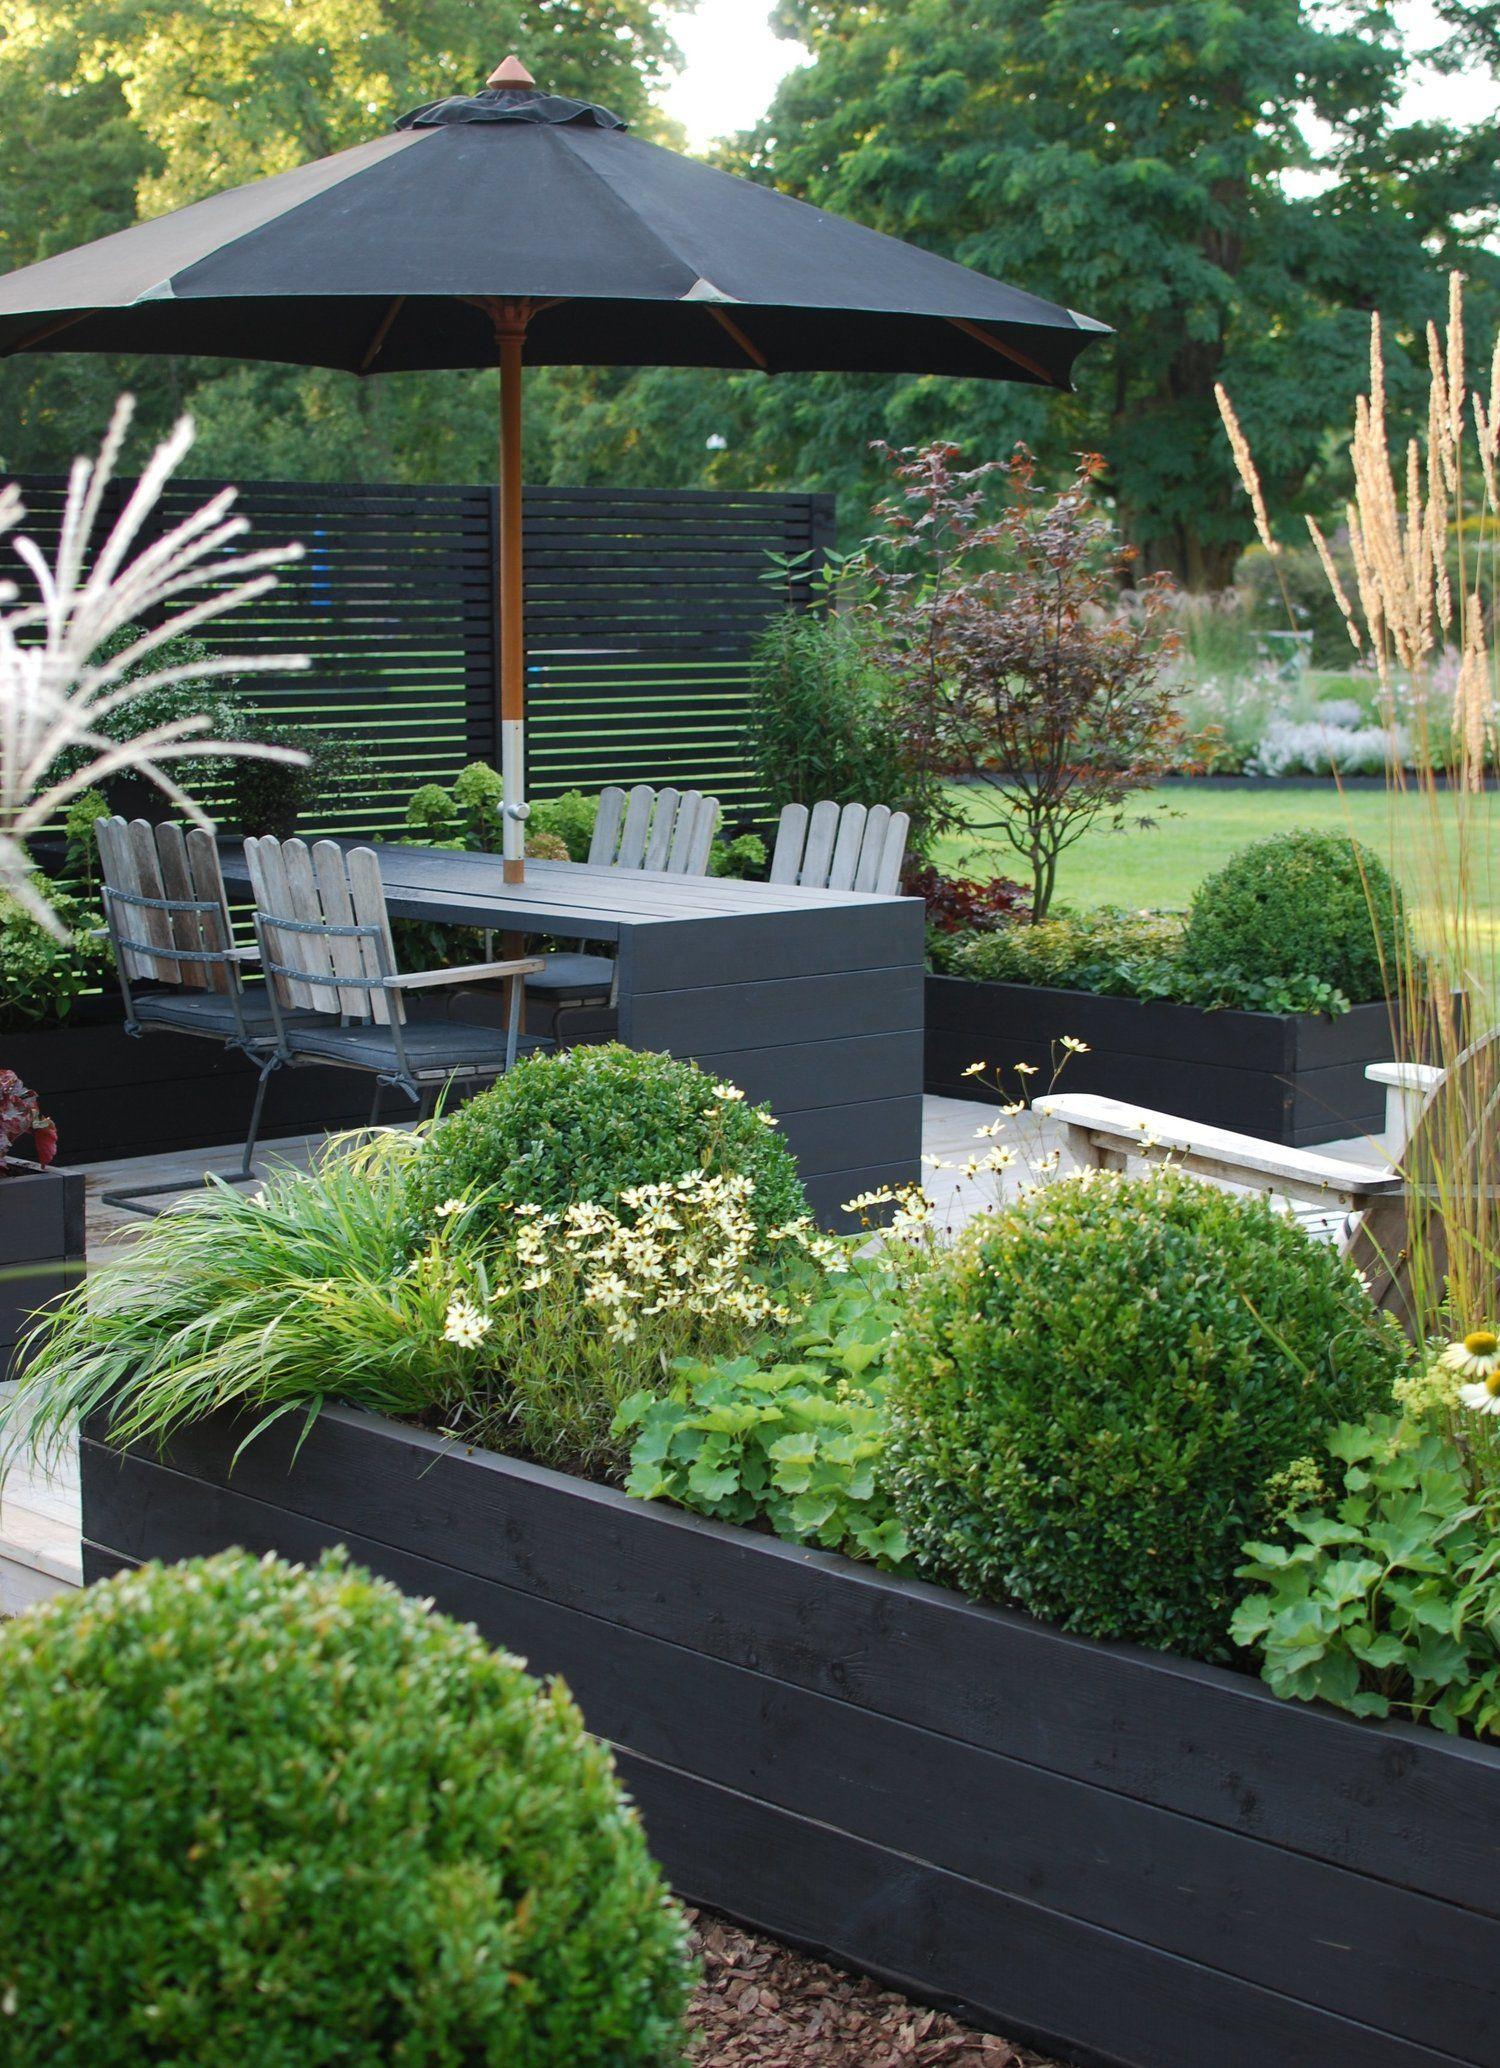 Almbacken garden design jolies terrasses au jardin for Amenagement jardin 78